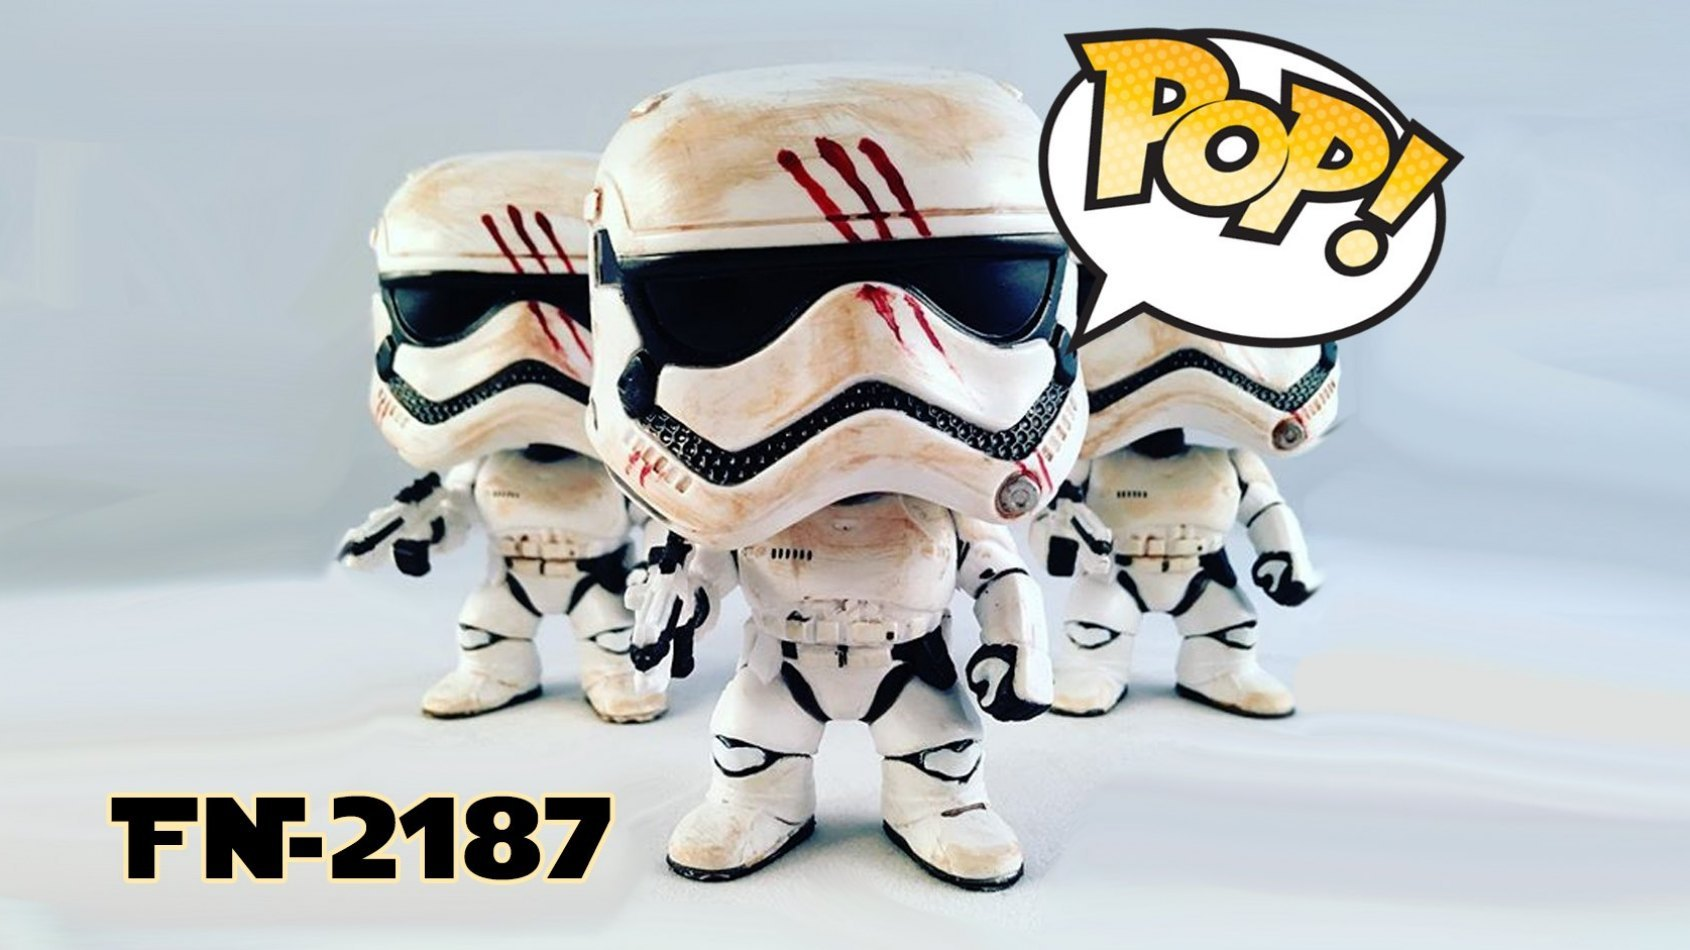 Découvrez la figurine Funko POP: FN-2187